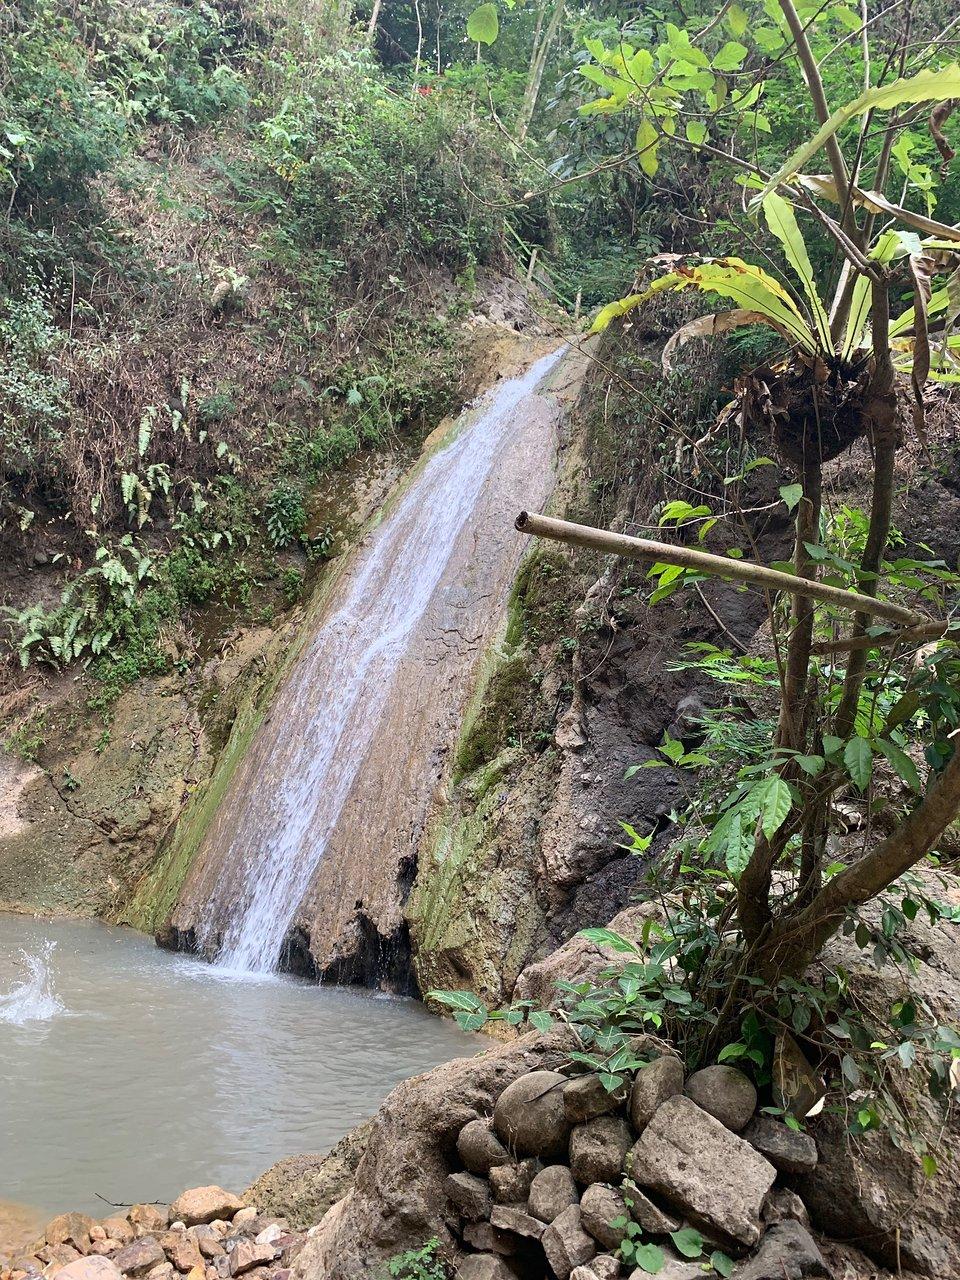 Air Terjun Kedung Pedut Kulon Progo Indonesia Review